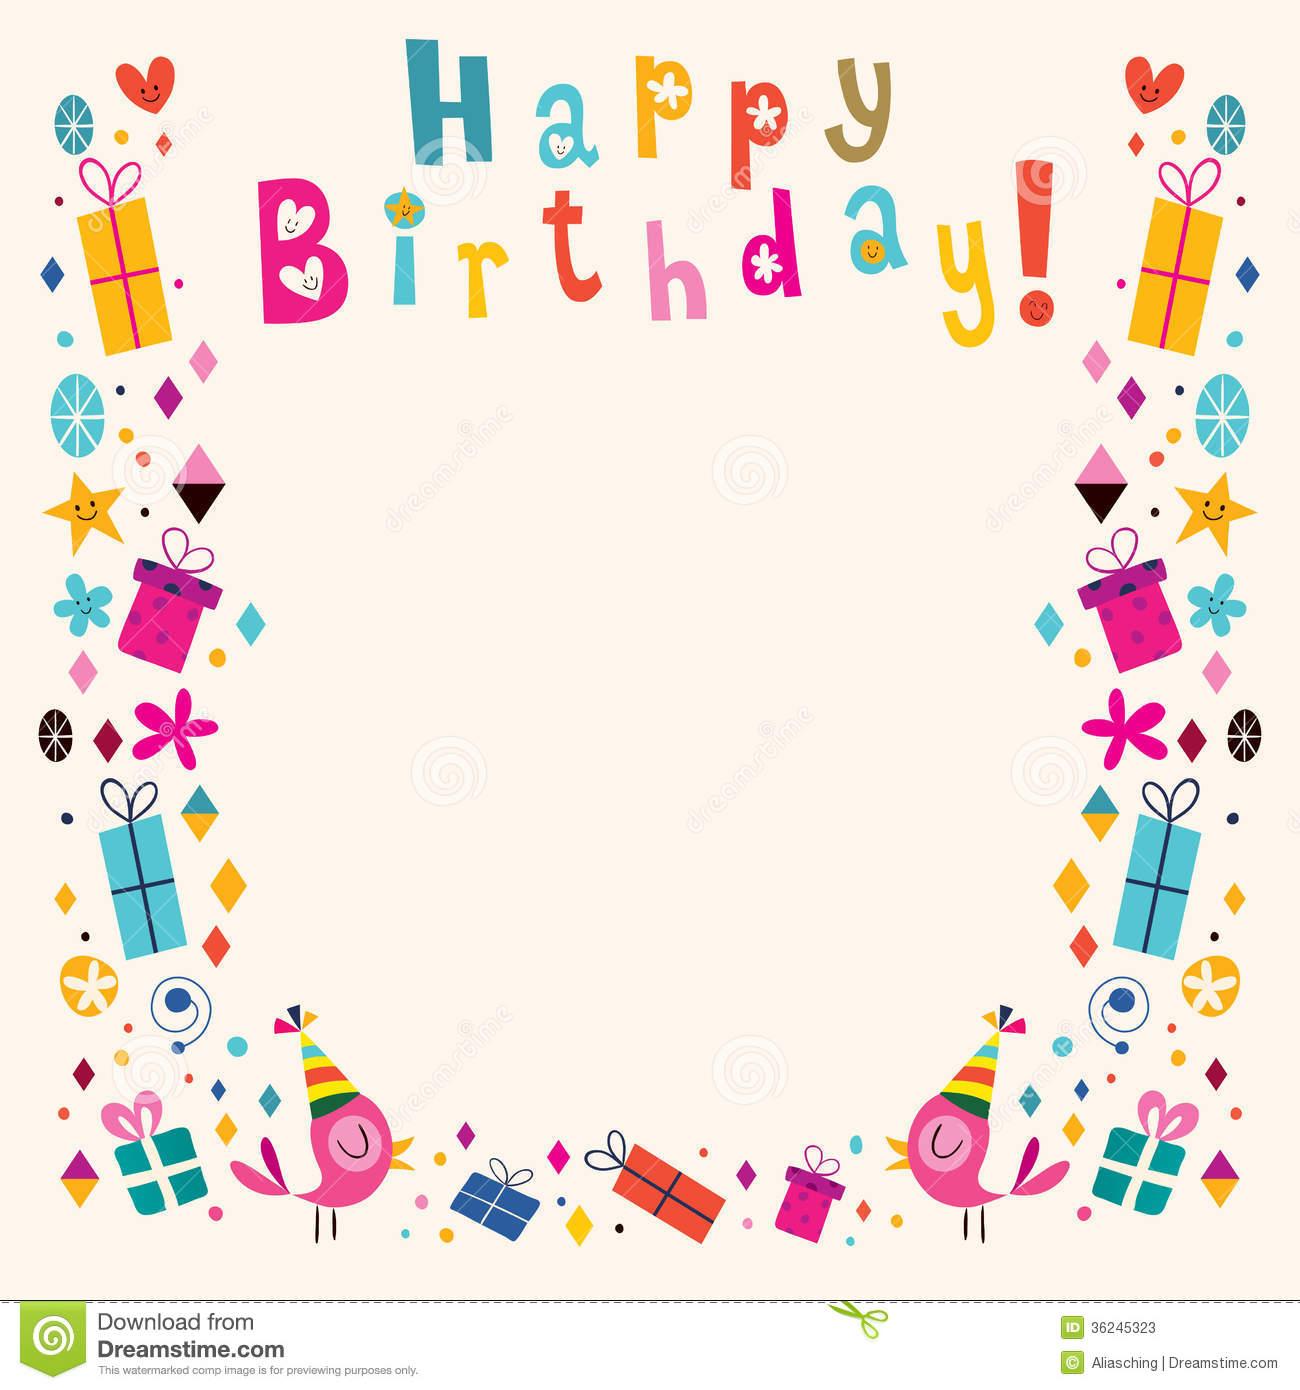 Happy Birthday Border Retro C - Birthday Clip Art Borders